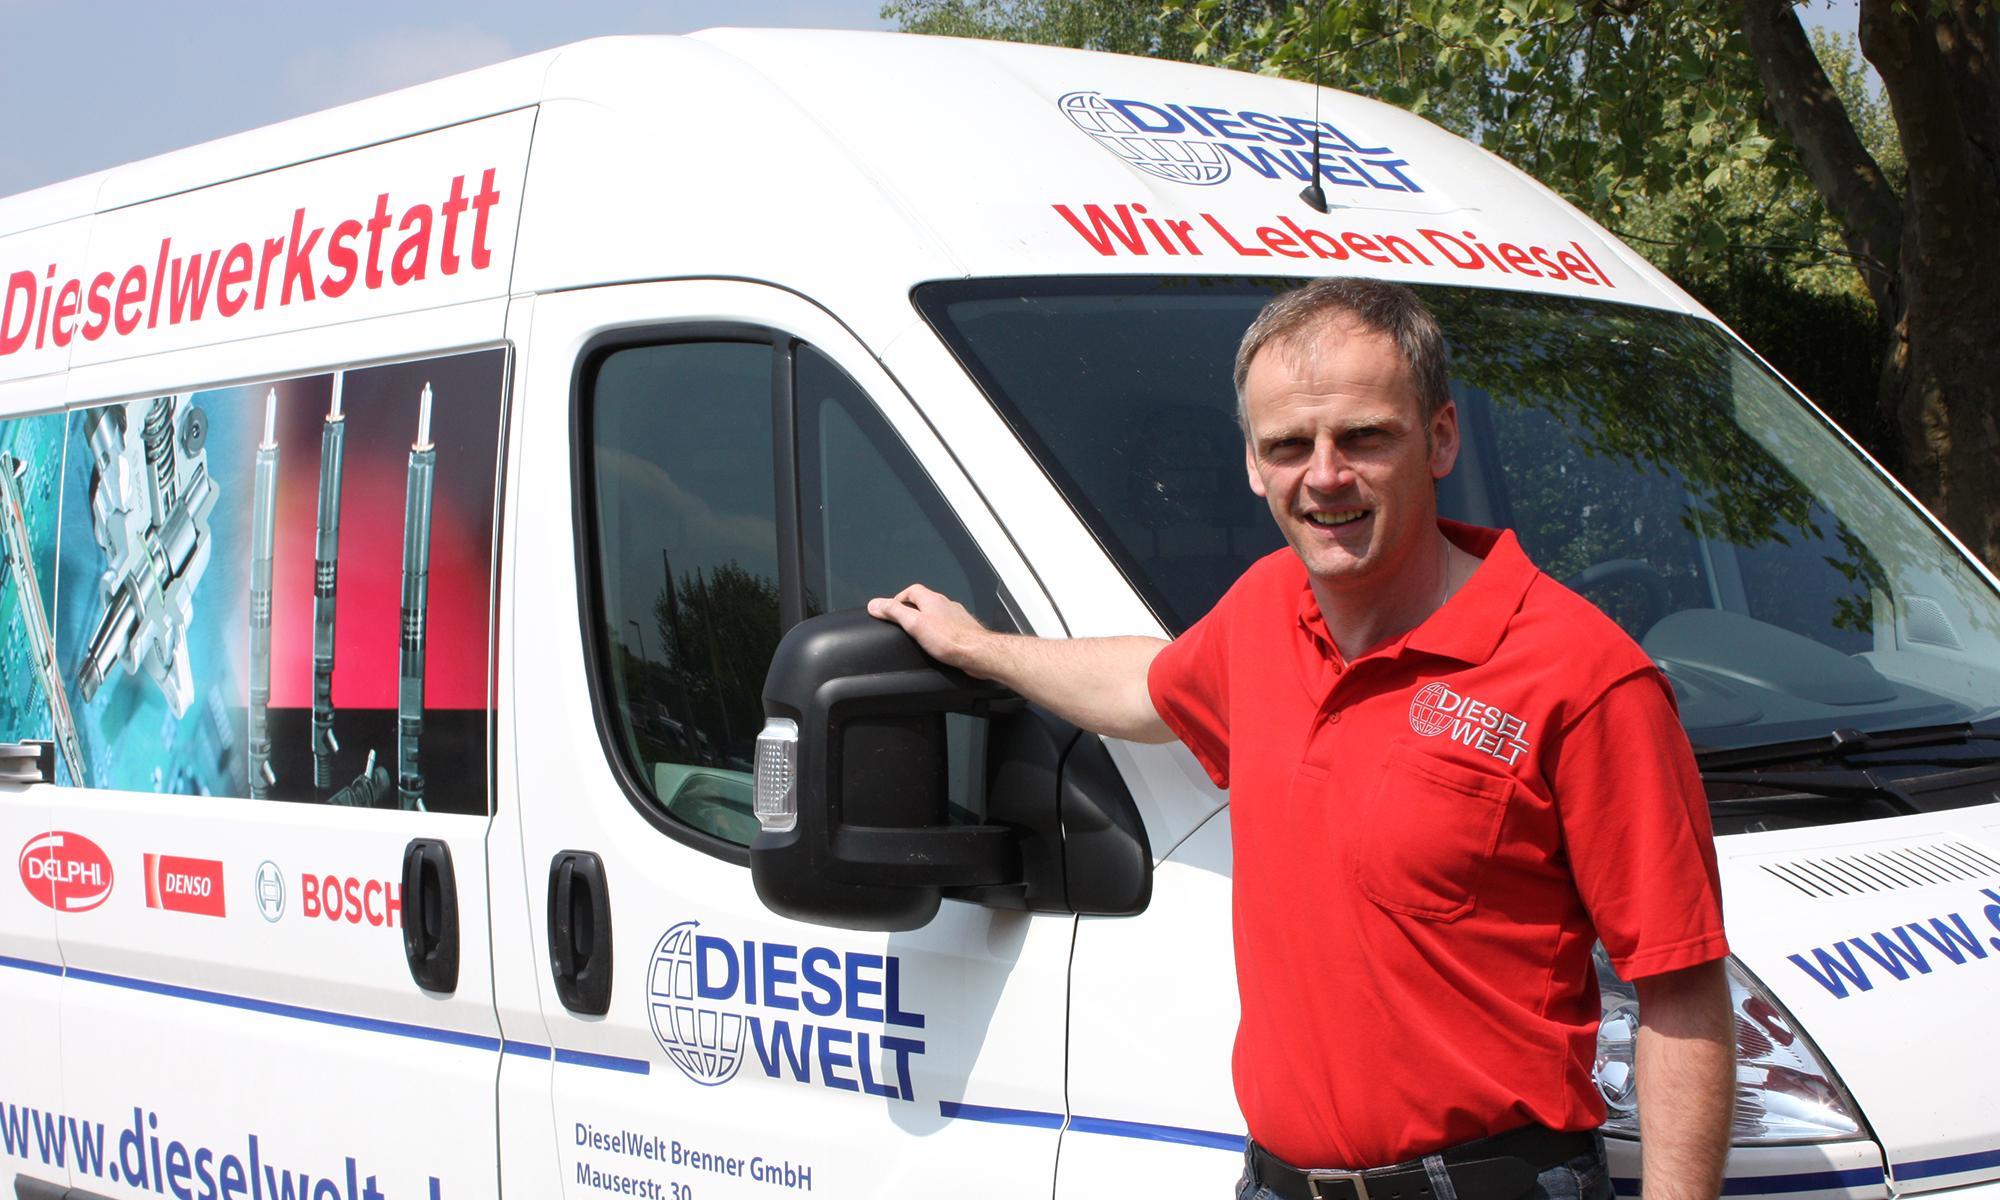 DieselWelt Brenner GmbH